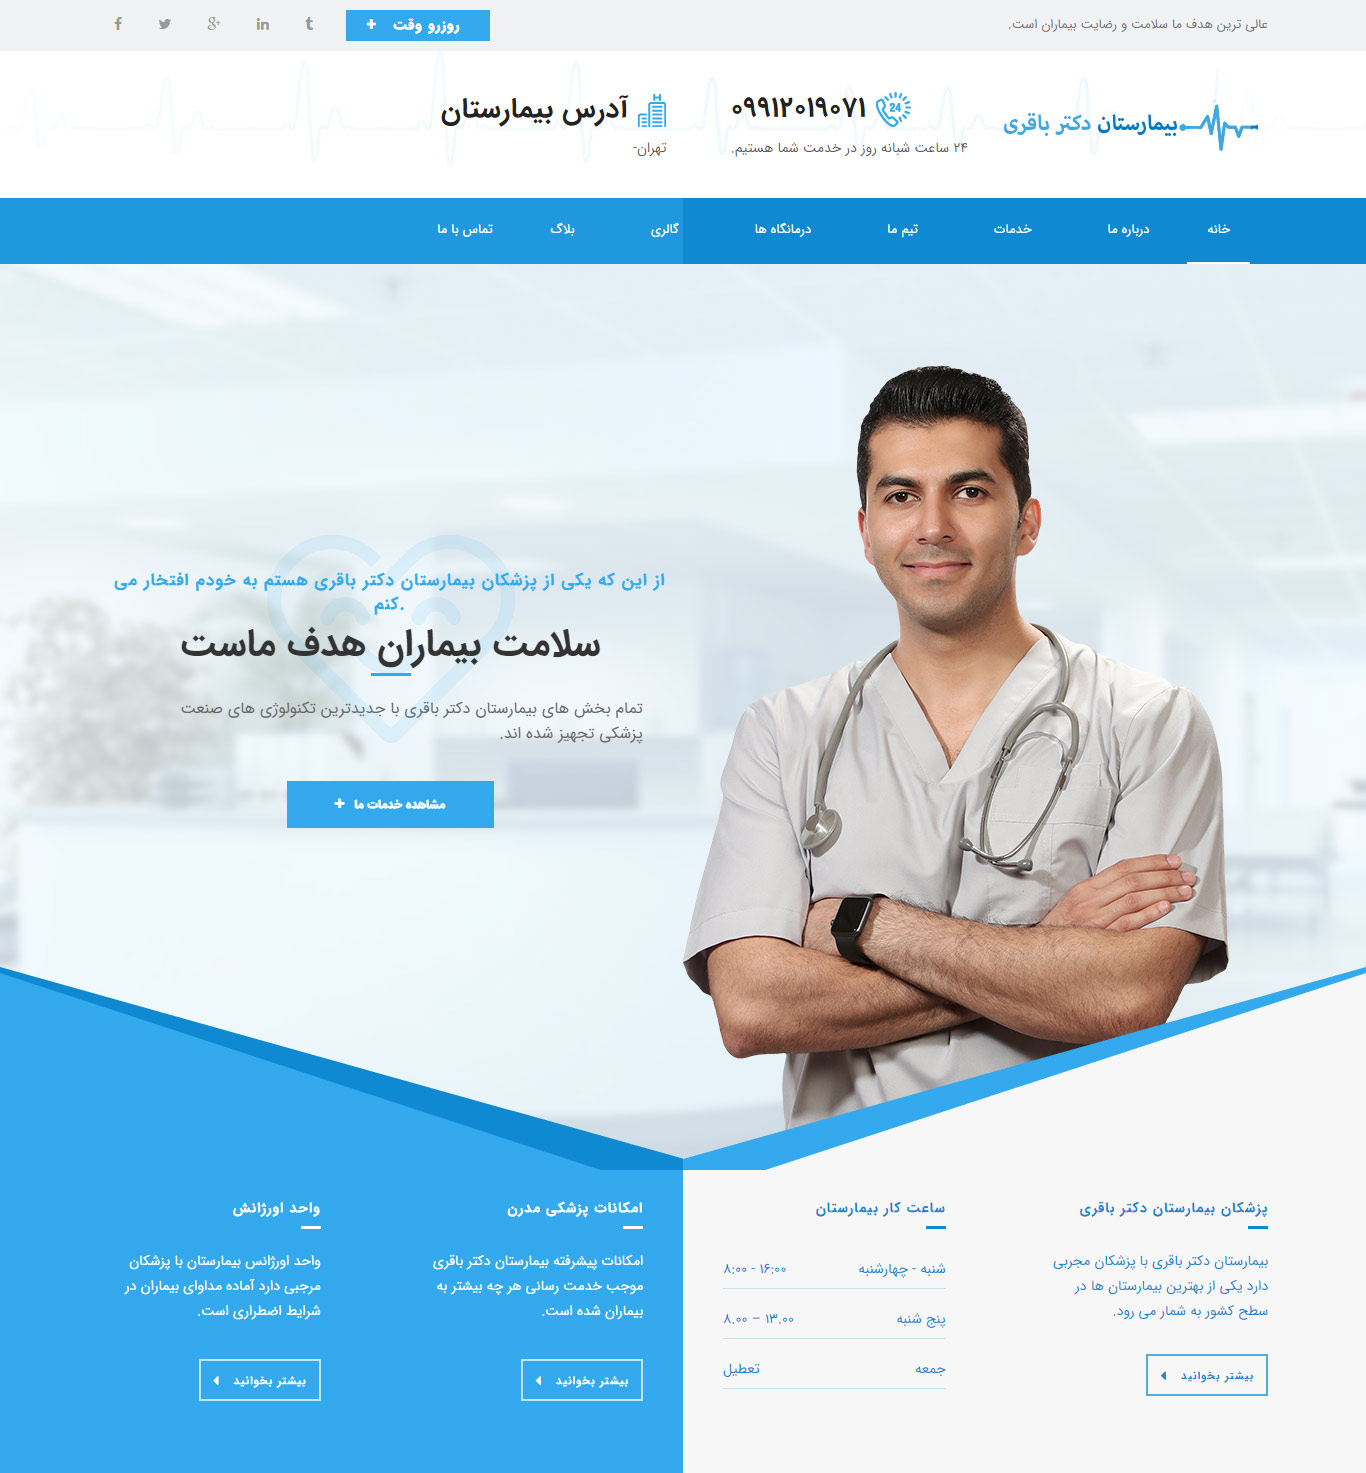 نمونه کاری طراحی سایت پزشکی